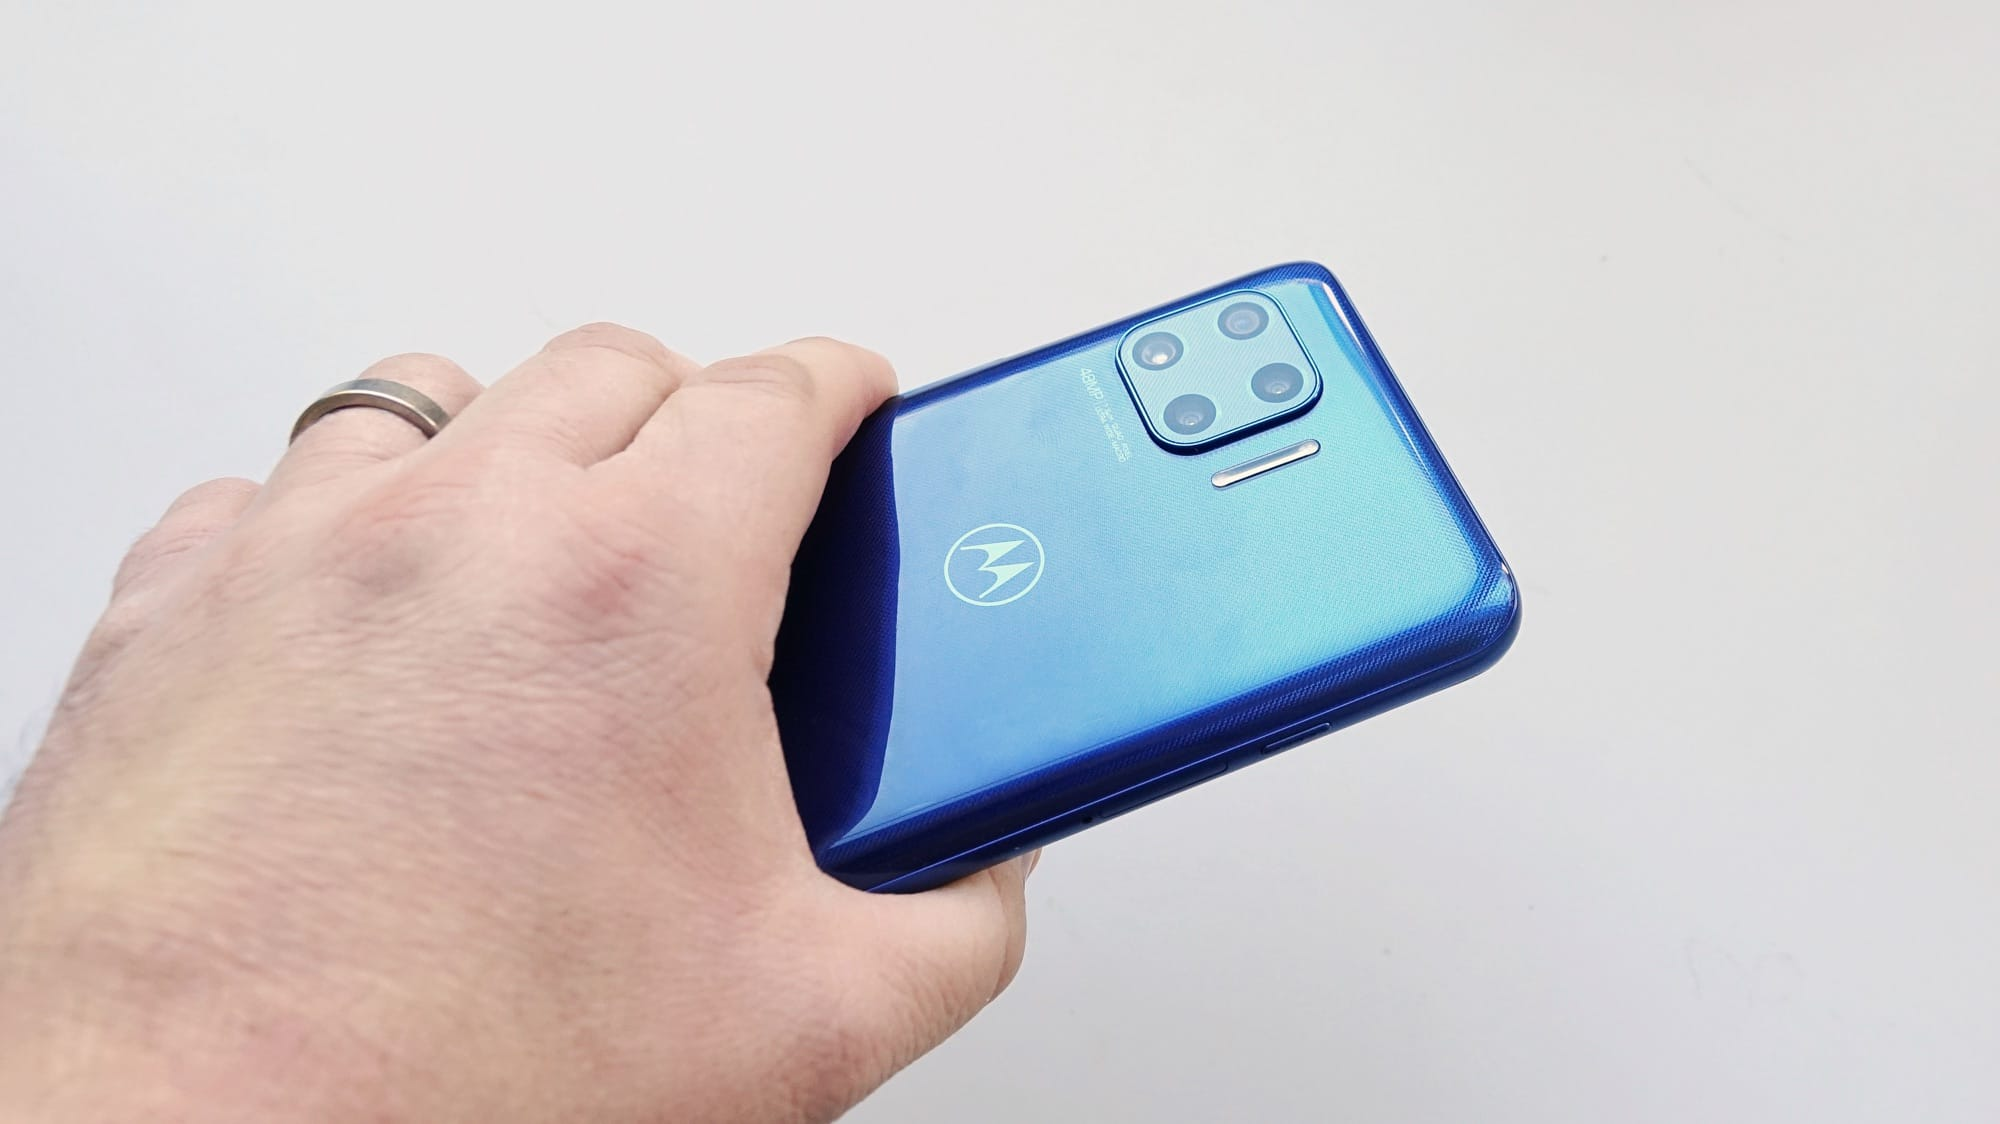 Holding the Moto G 5G Plus